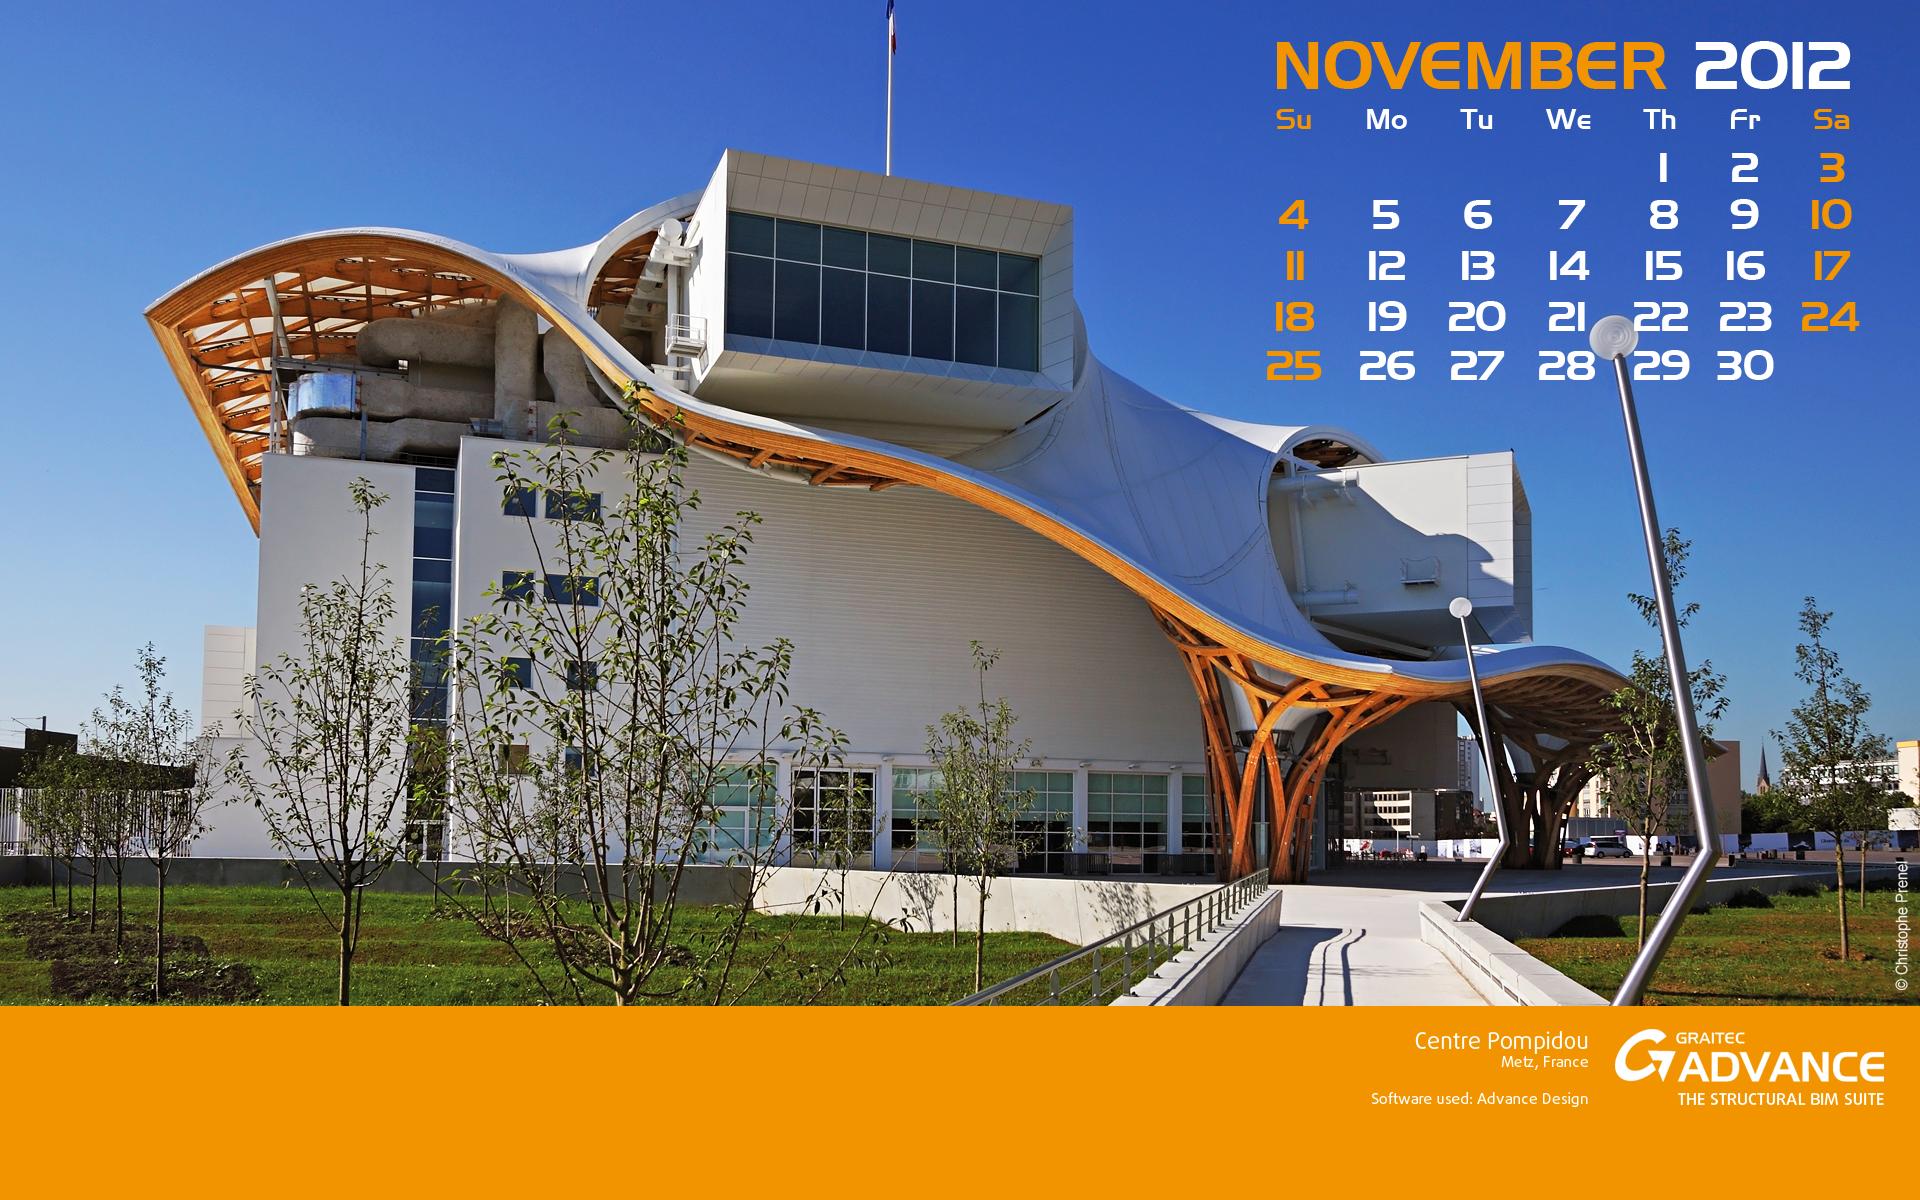 Download Graitec Wallpaper For November Civil Engineering Software Solutions